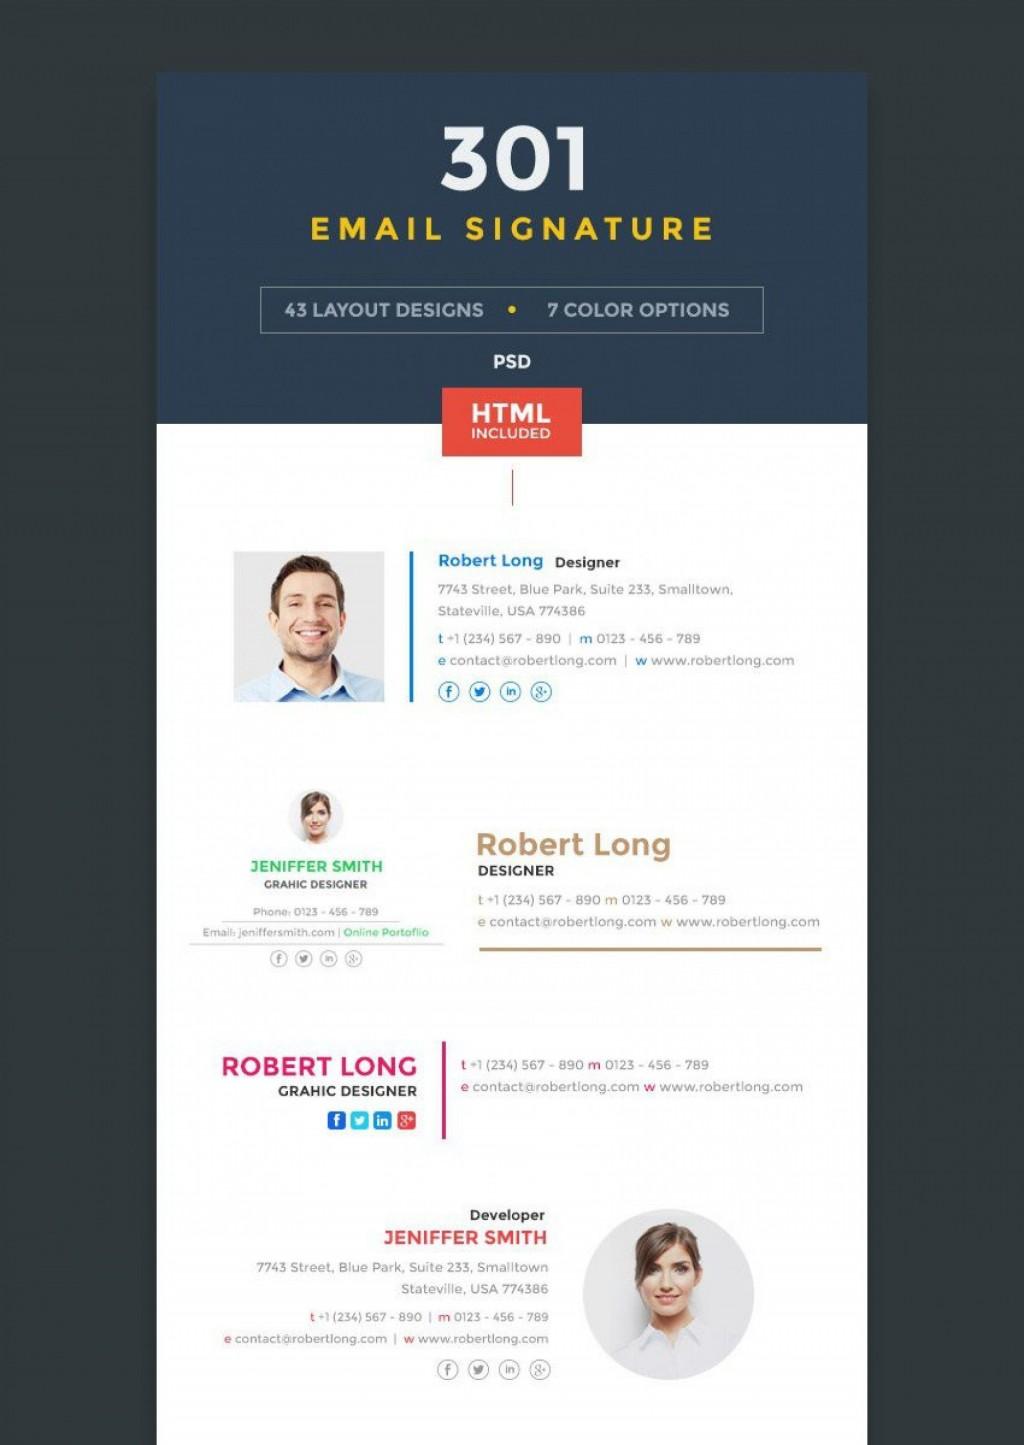 007 Shocking Email Signature Design Outlook Free Image Large